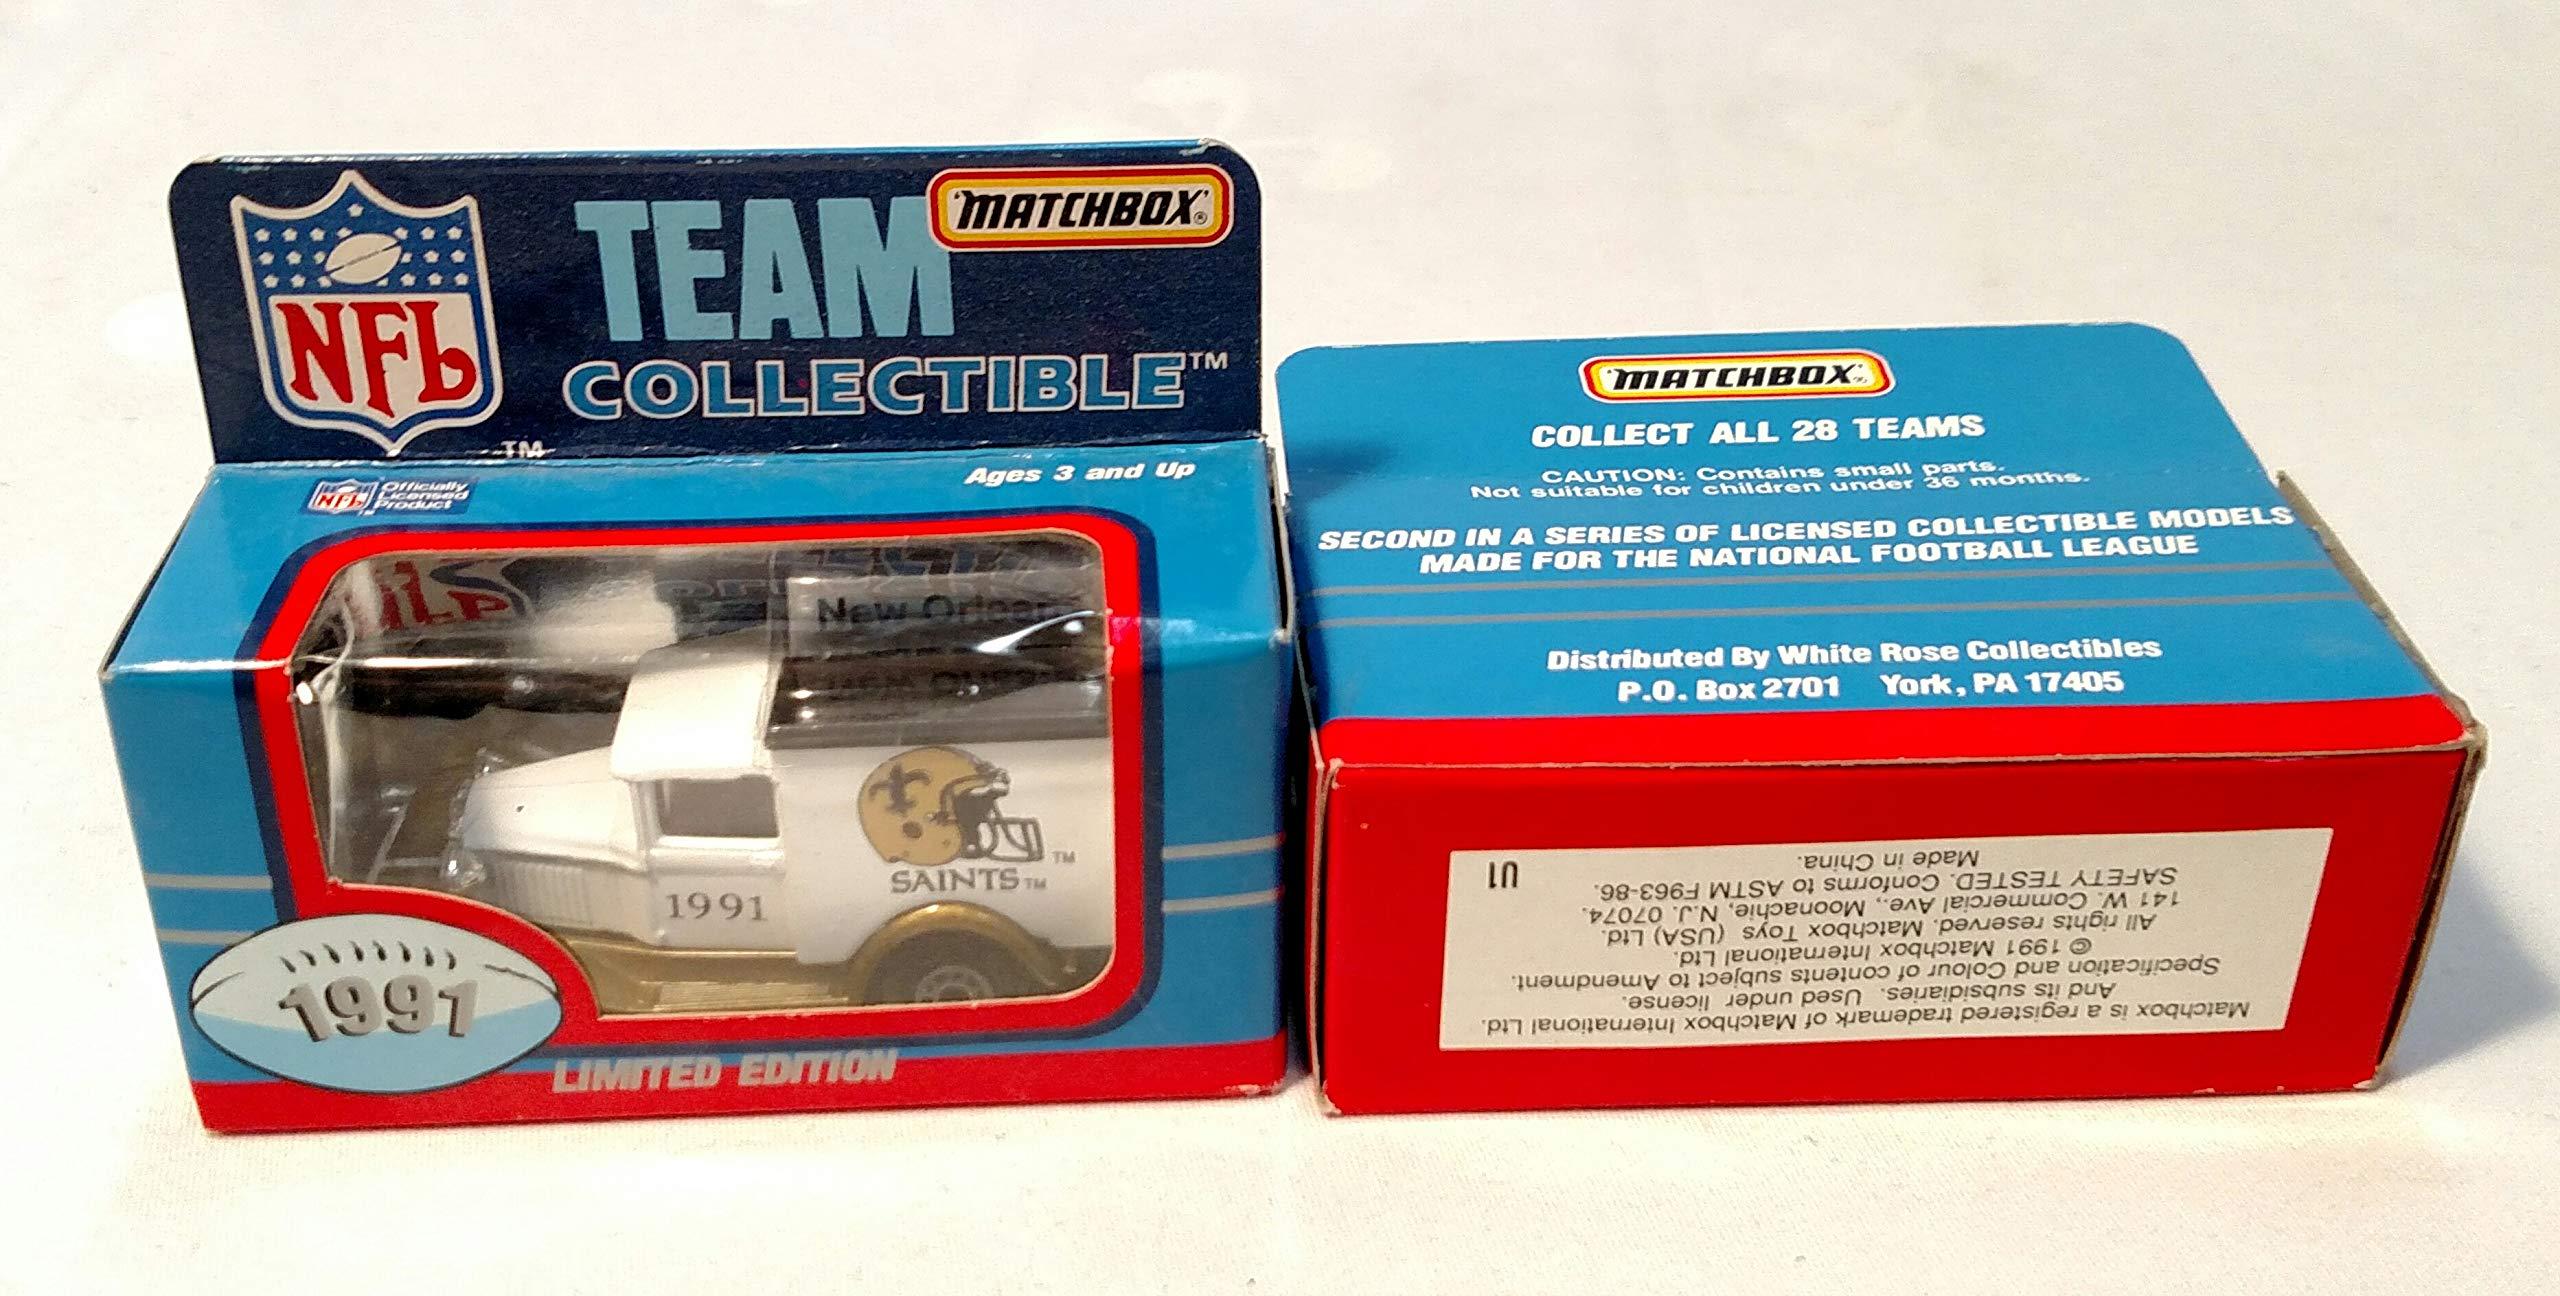 New Orleans Saints 1991 Limited Edition Matchbox Die Cast Collectible